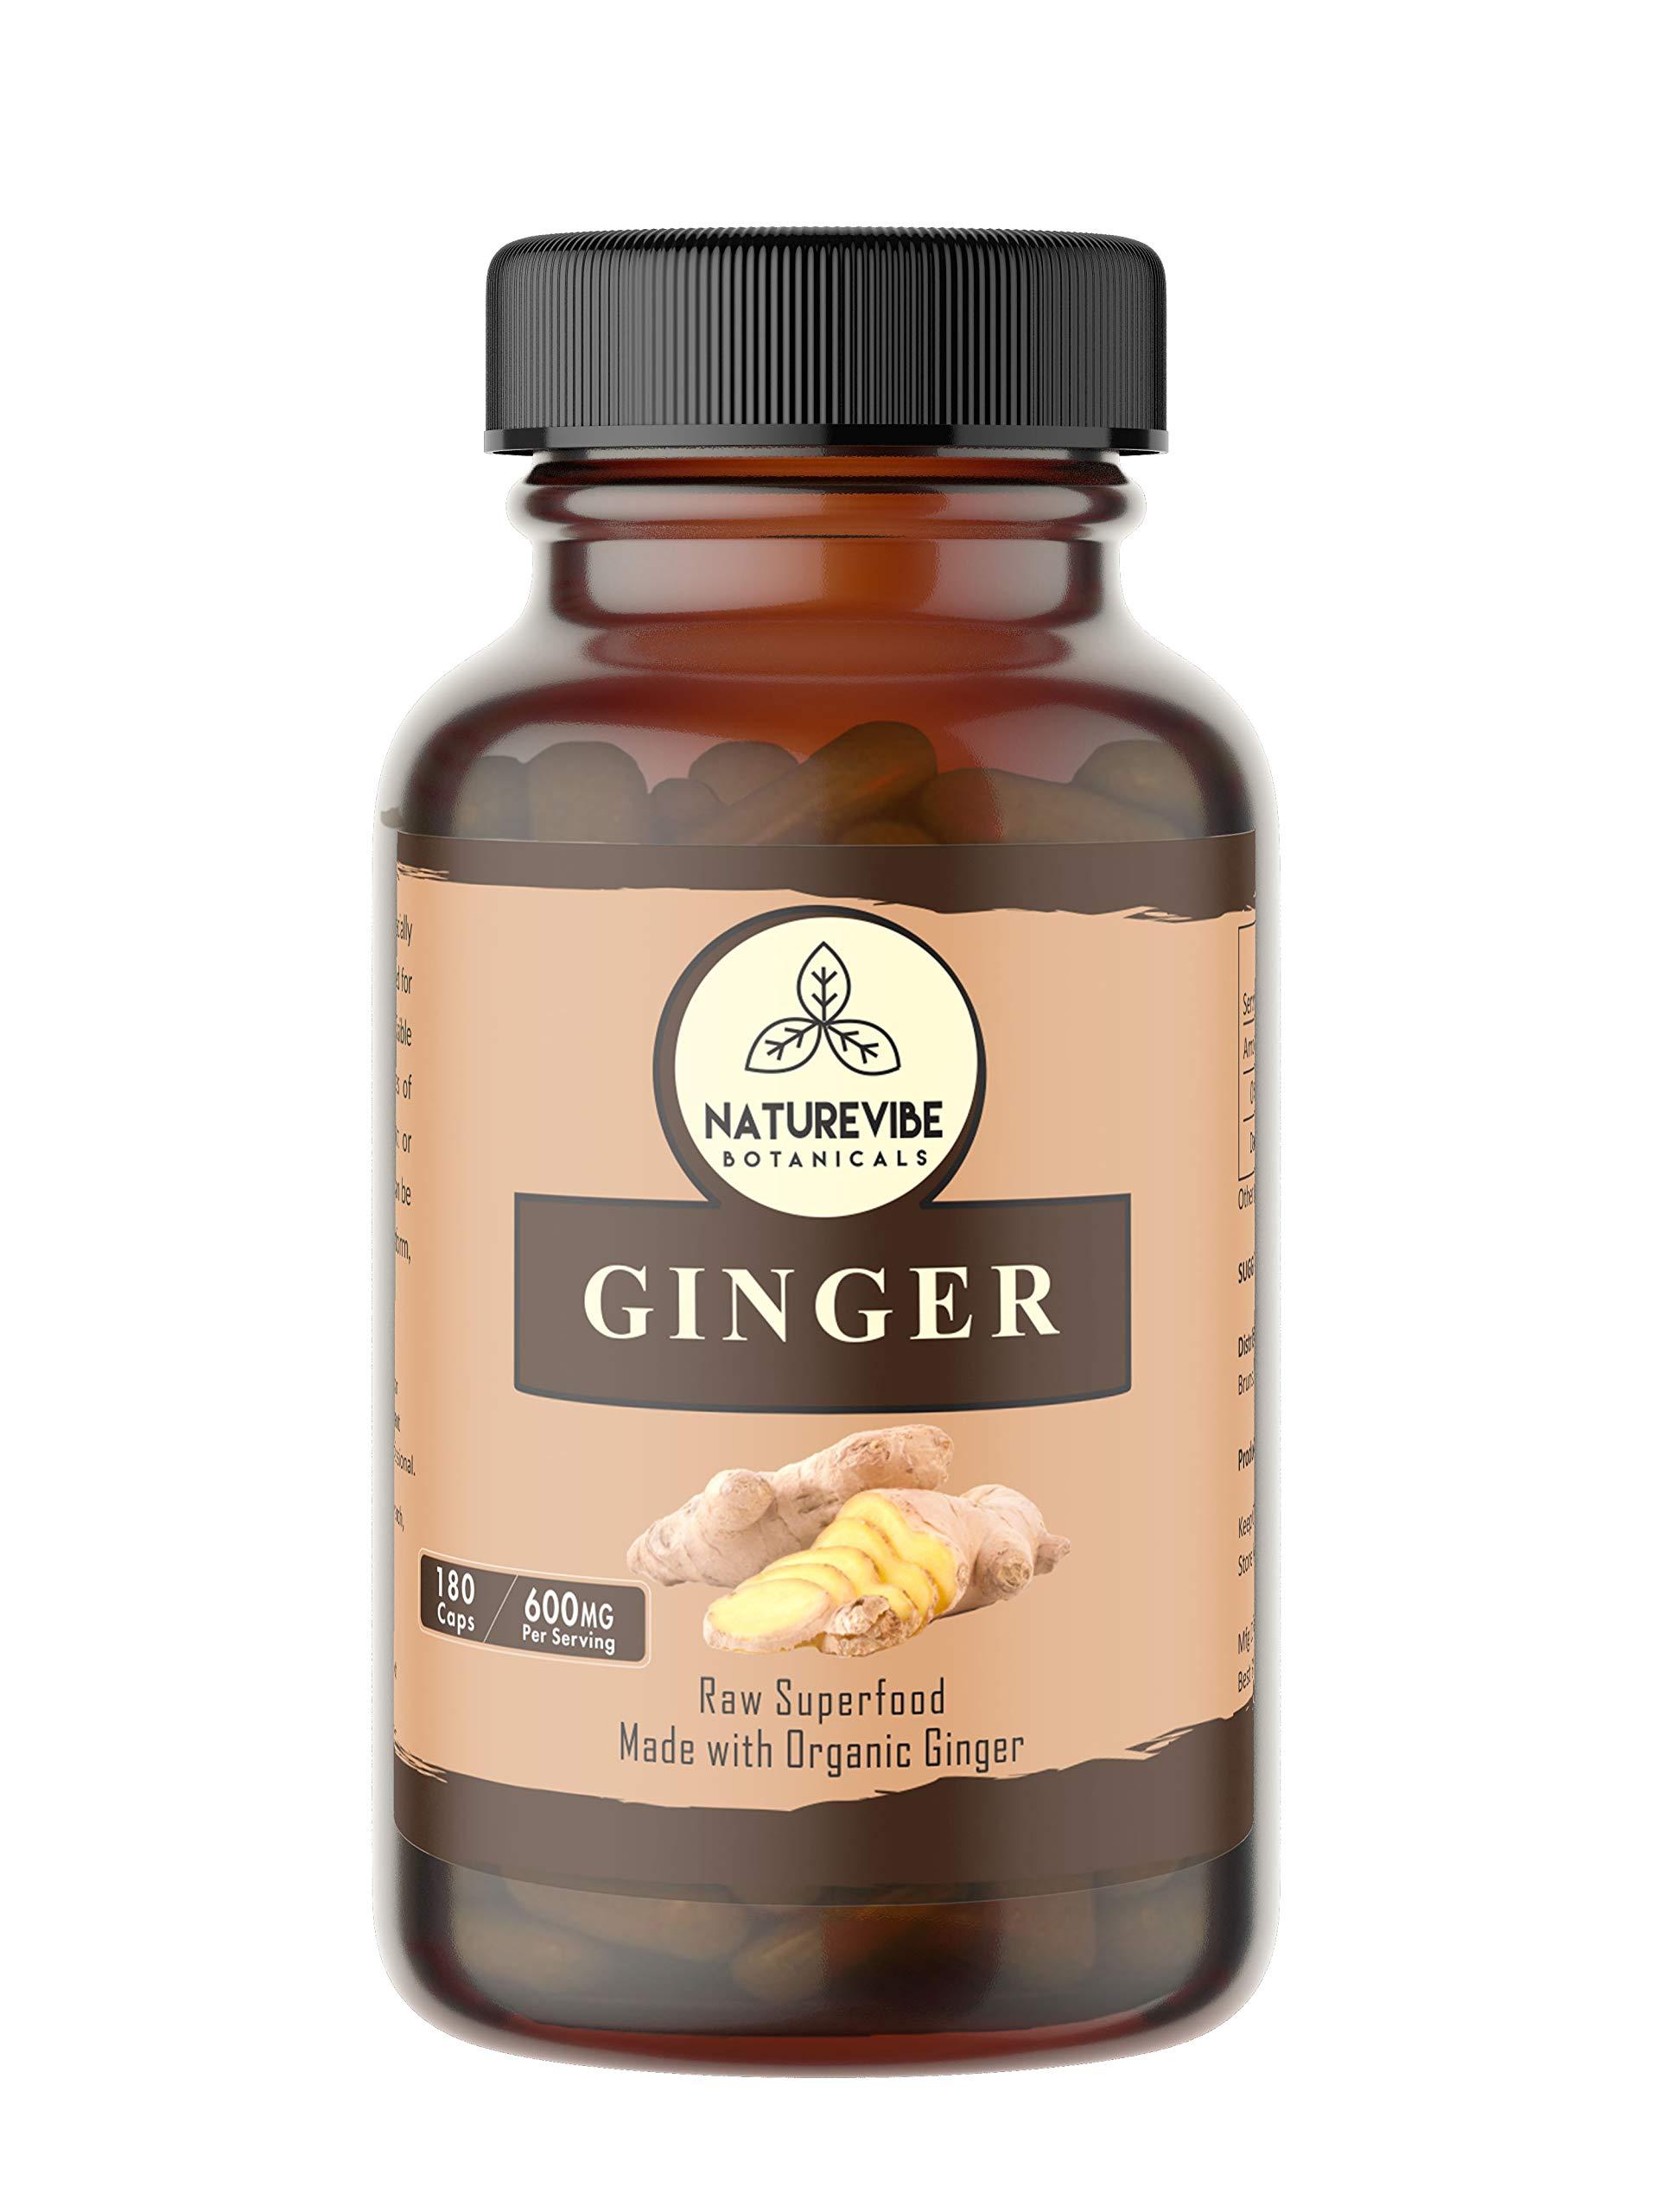 Naturevibe Botanicals 180 Ginger Root Capsules,100% Organic Ginger Root Powder, 600mg Per Serving | Veg Capsules | Gluten Free